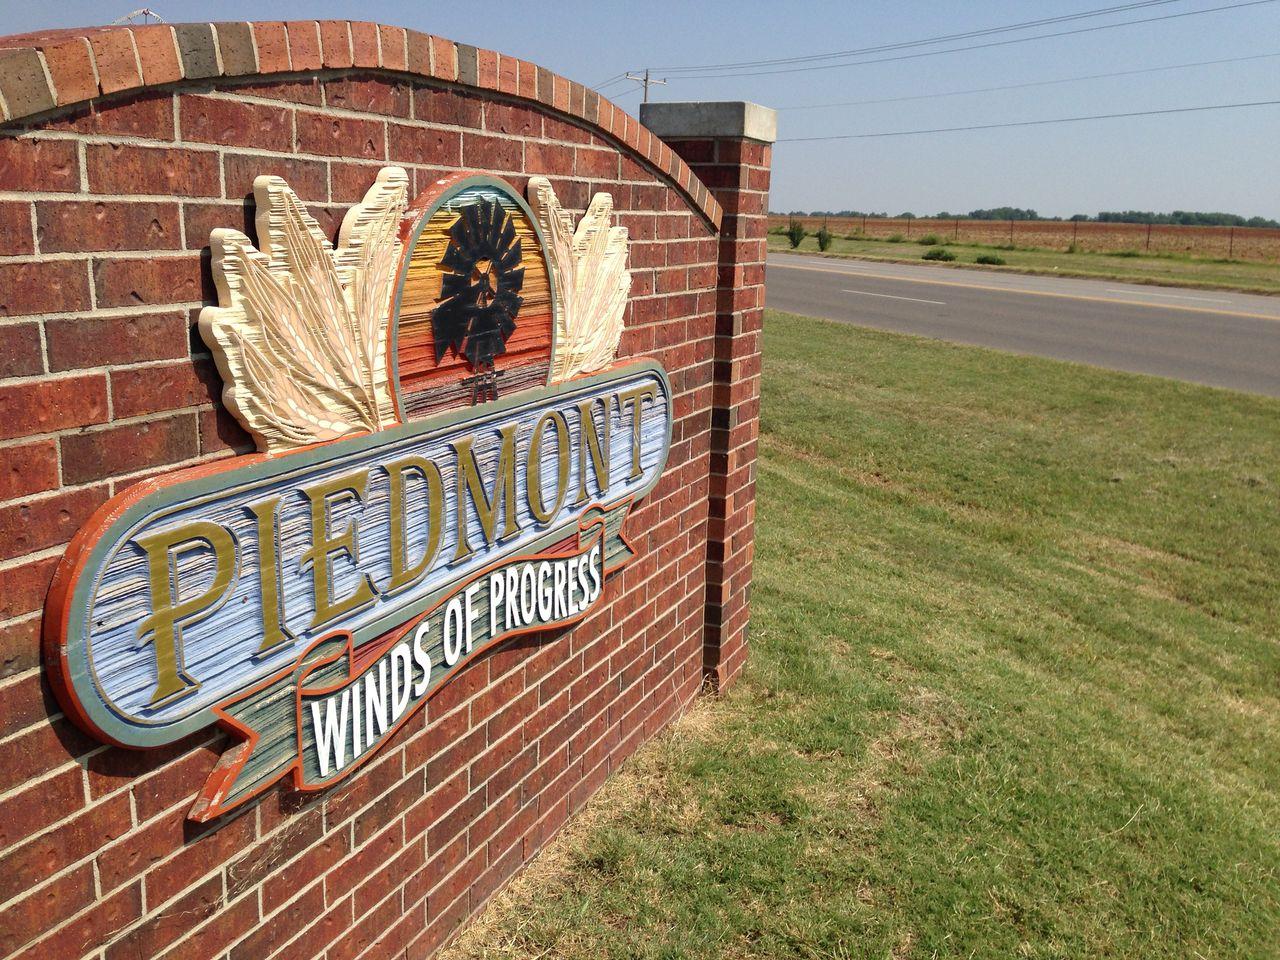 Piedmont sign